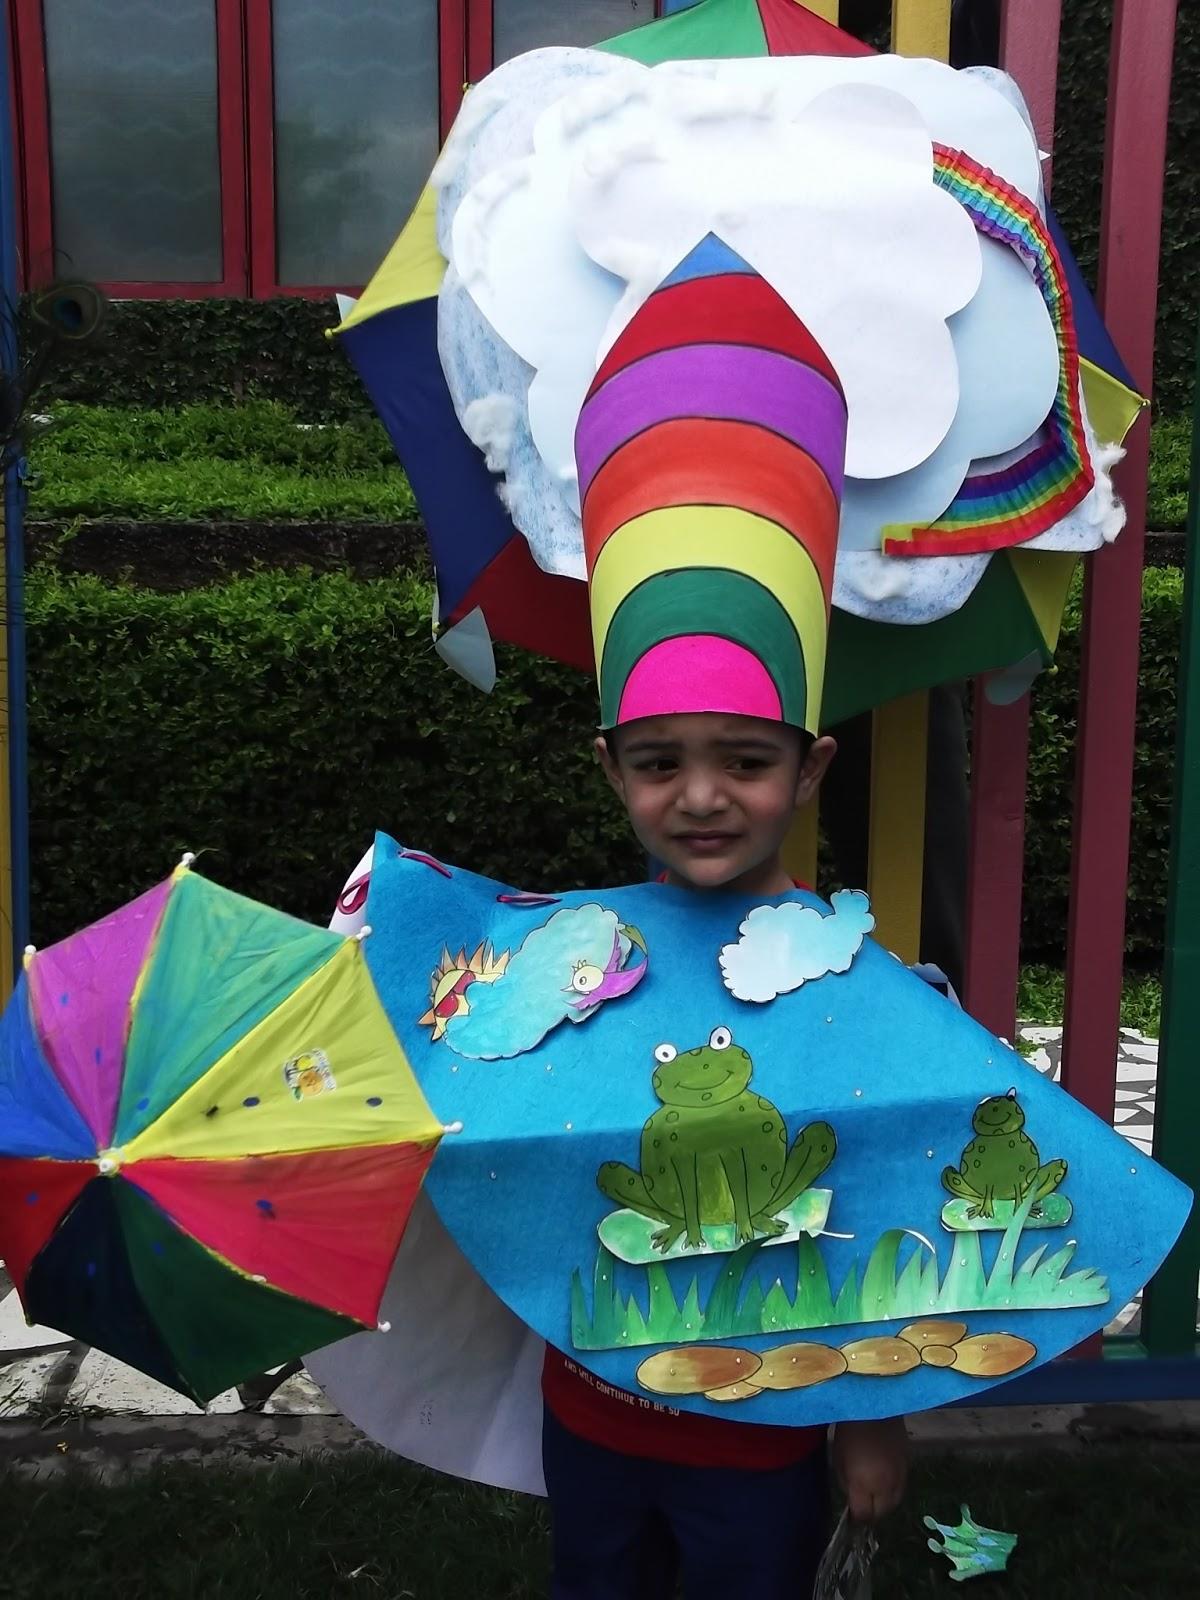 DEWS - The School, Panchkula: Fancy Dress Competition on Rain theme